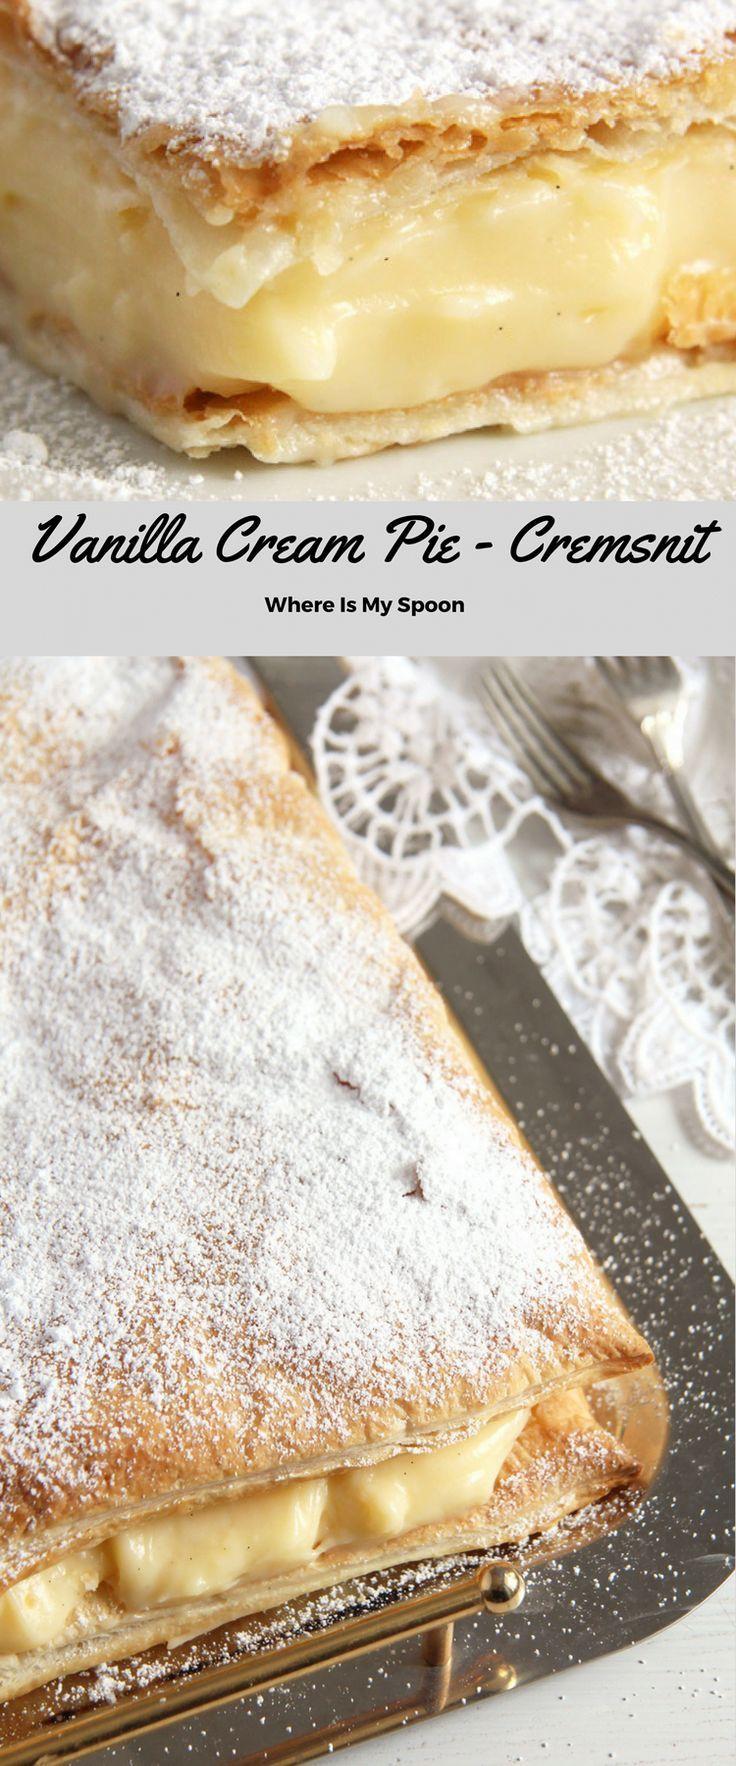 Cremeschnitte - Romanian Vanilla Cream Pie #sweetpie